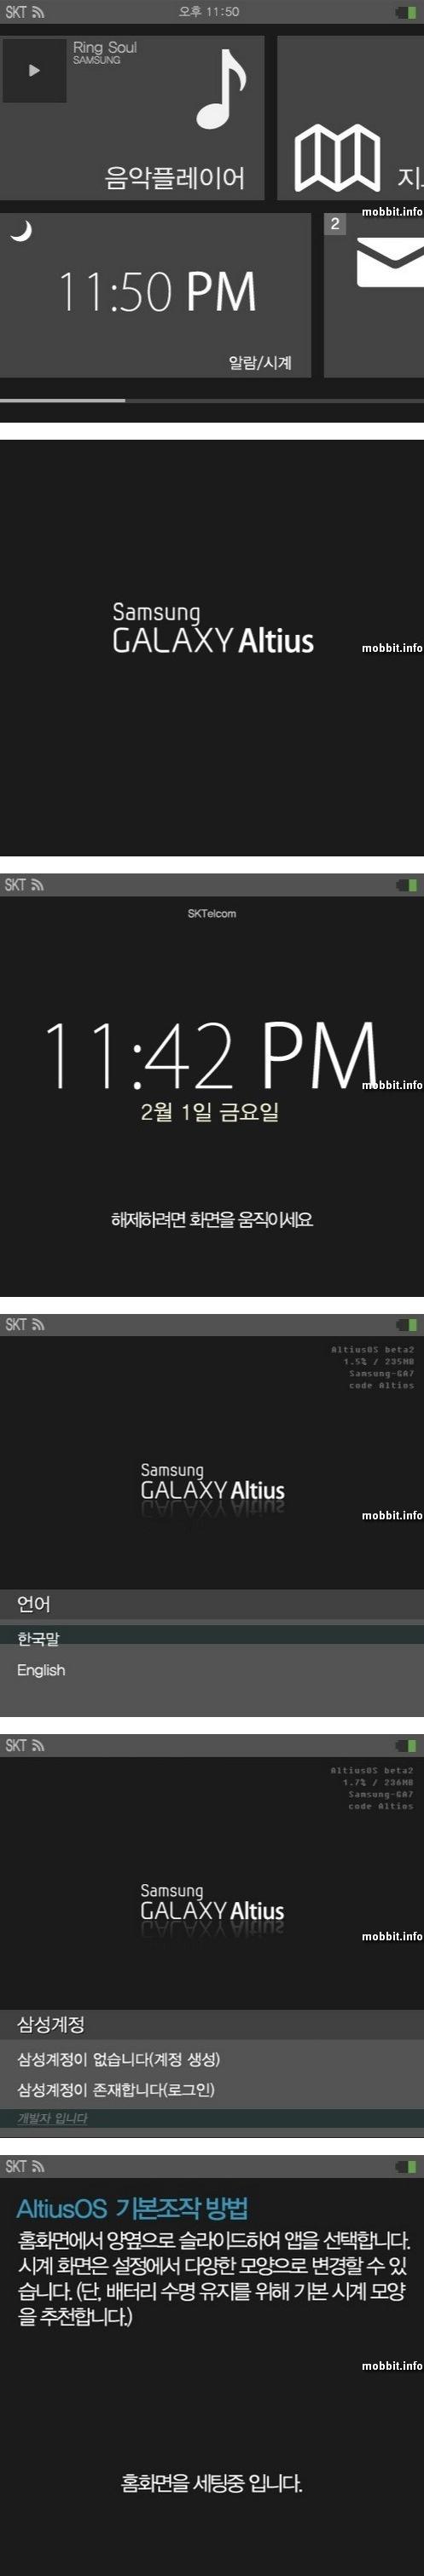 Galaxy Altius